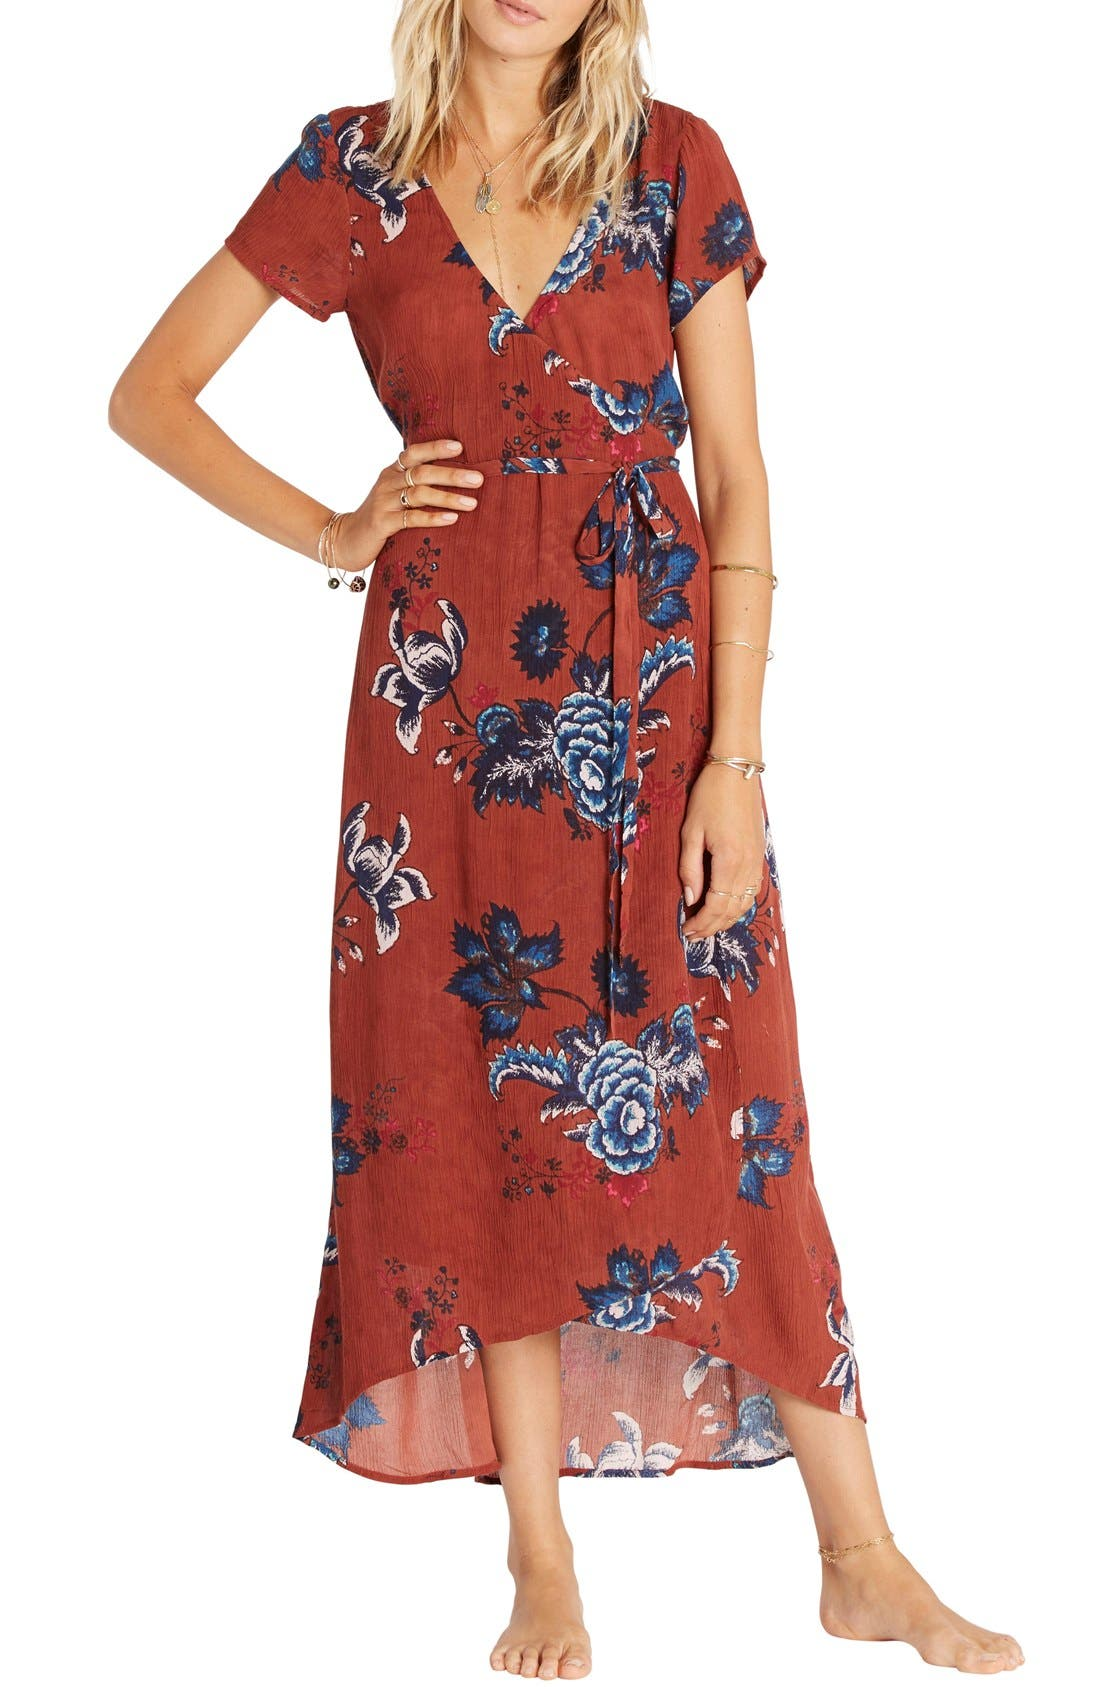 Alternate Image 1 Selected - Billabong Wrap Me Up Floral Print Maxi Dress